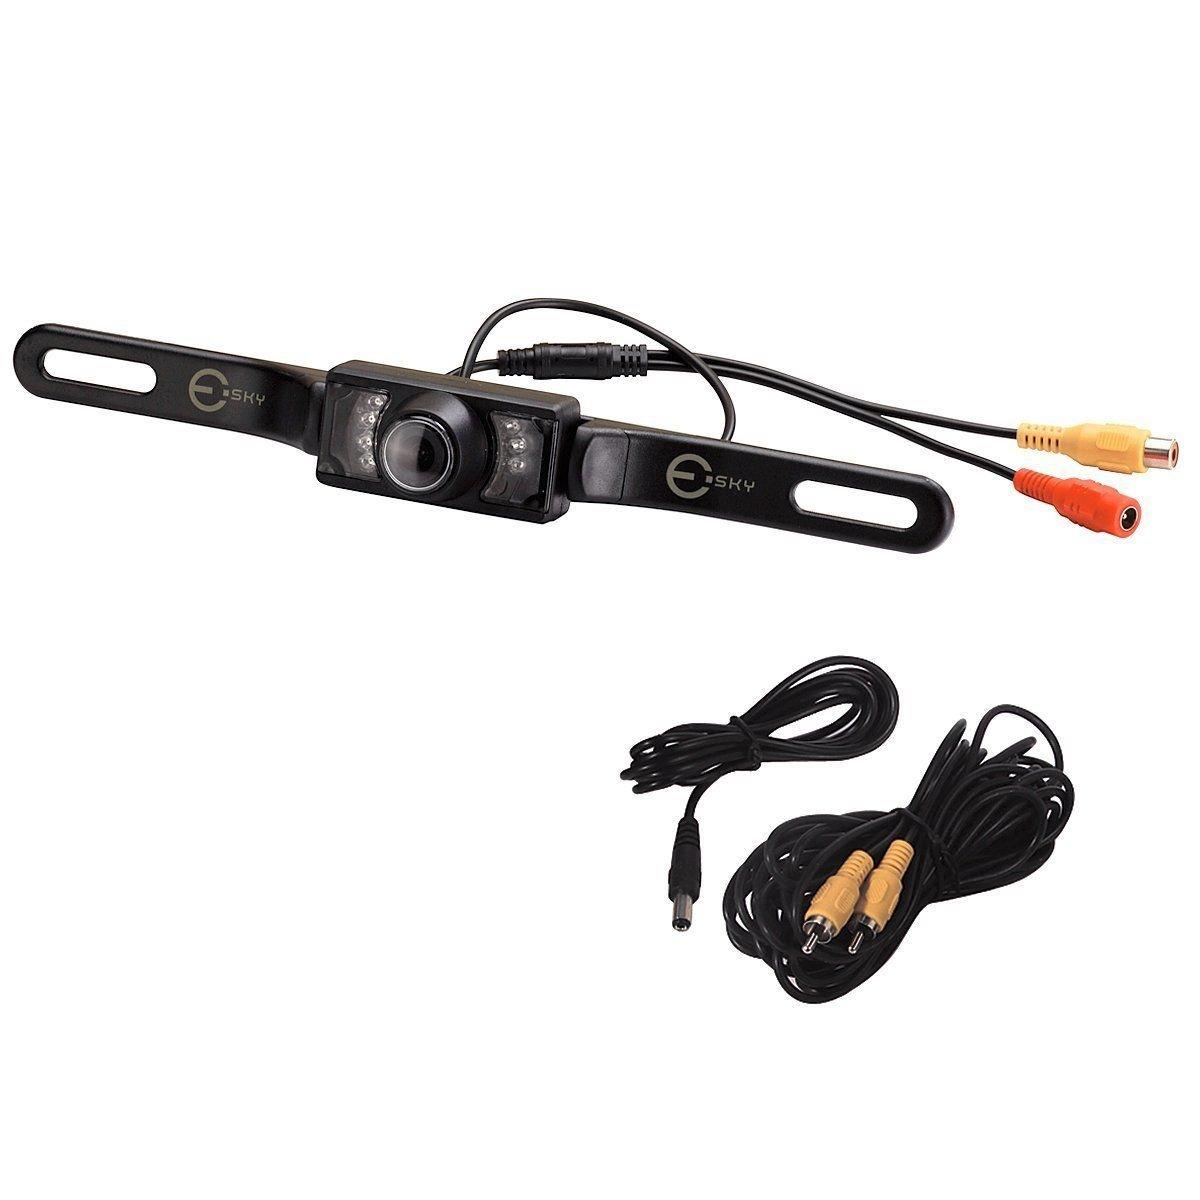 New Car Universal Rear View Reverse Backup Camera 7 LED Night Vision NTSC TV SY